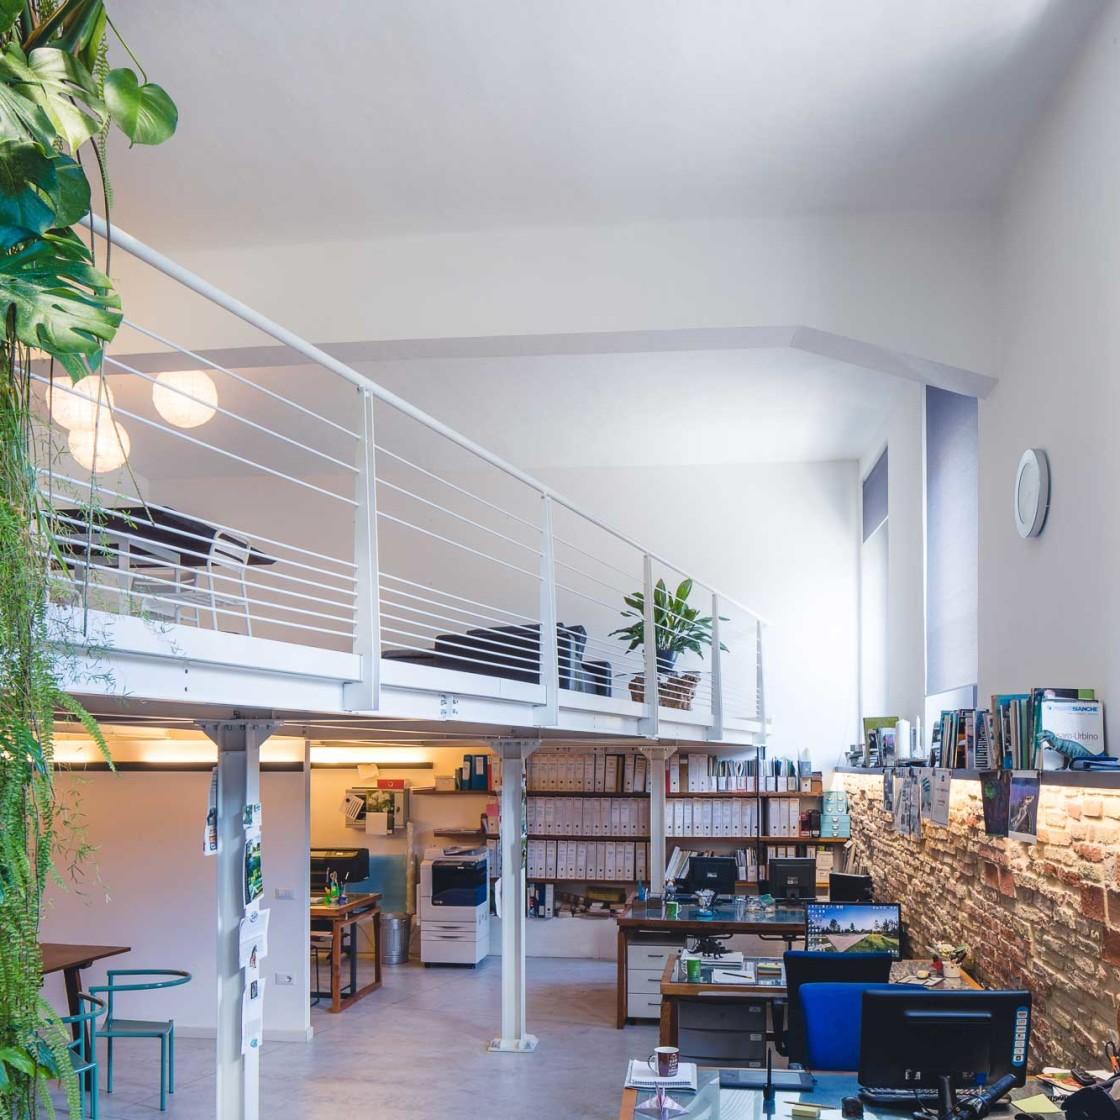 Lo studio Landesign